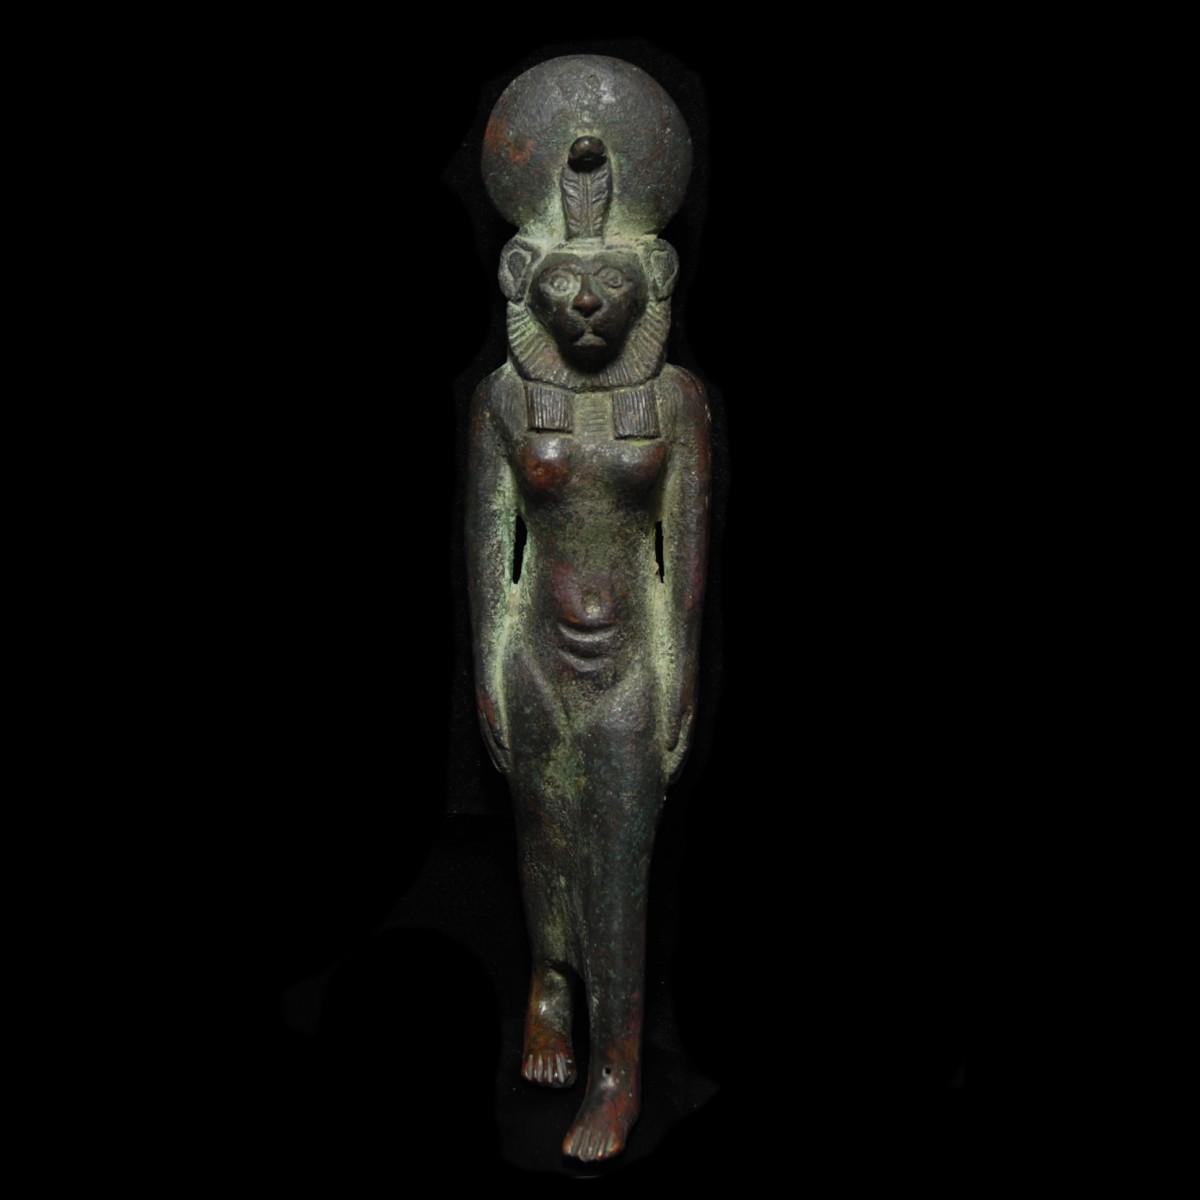 Egyptian Bronze statuette of Sekhmet